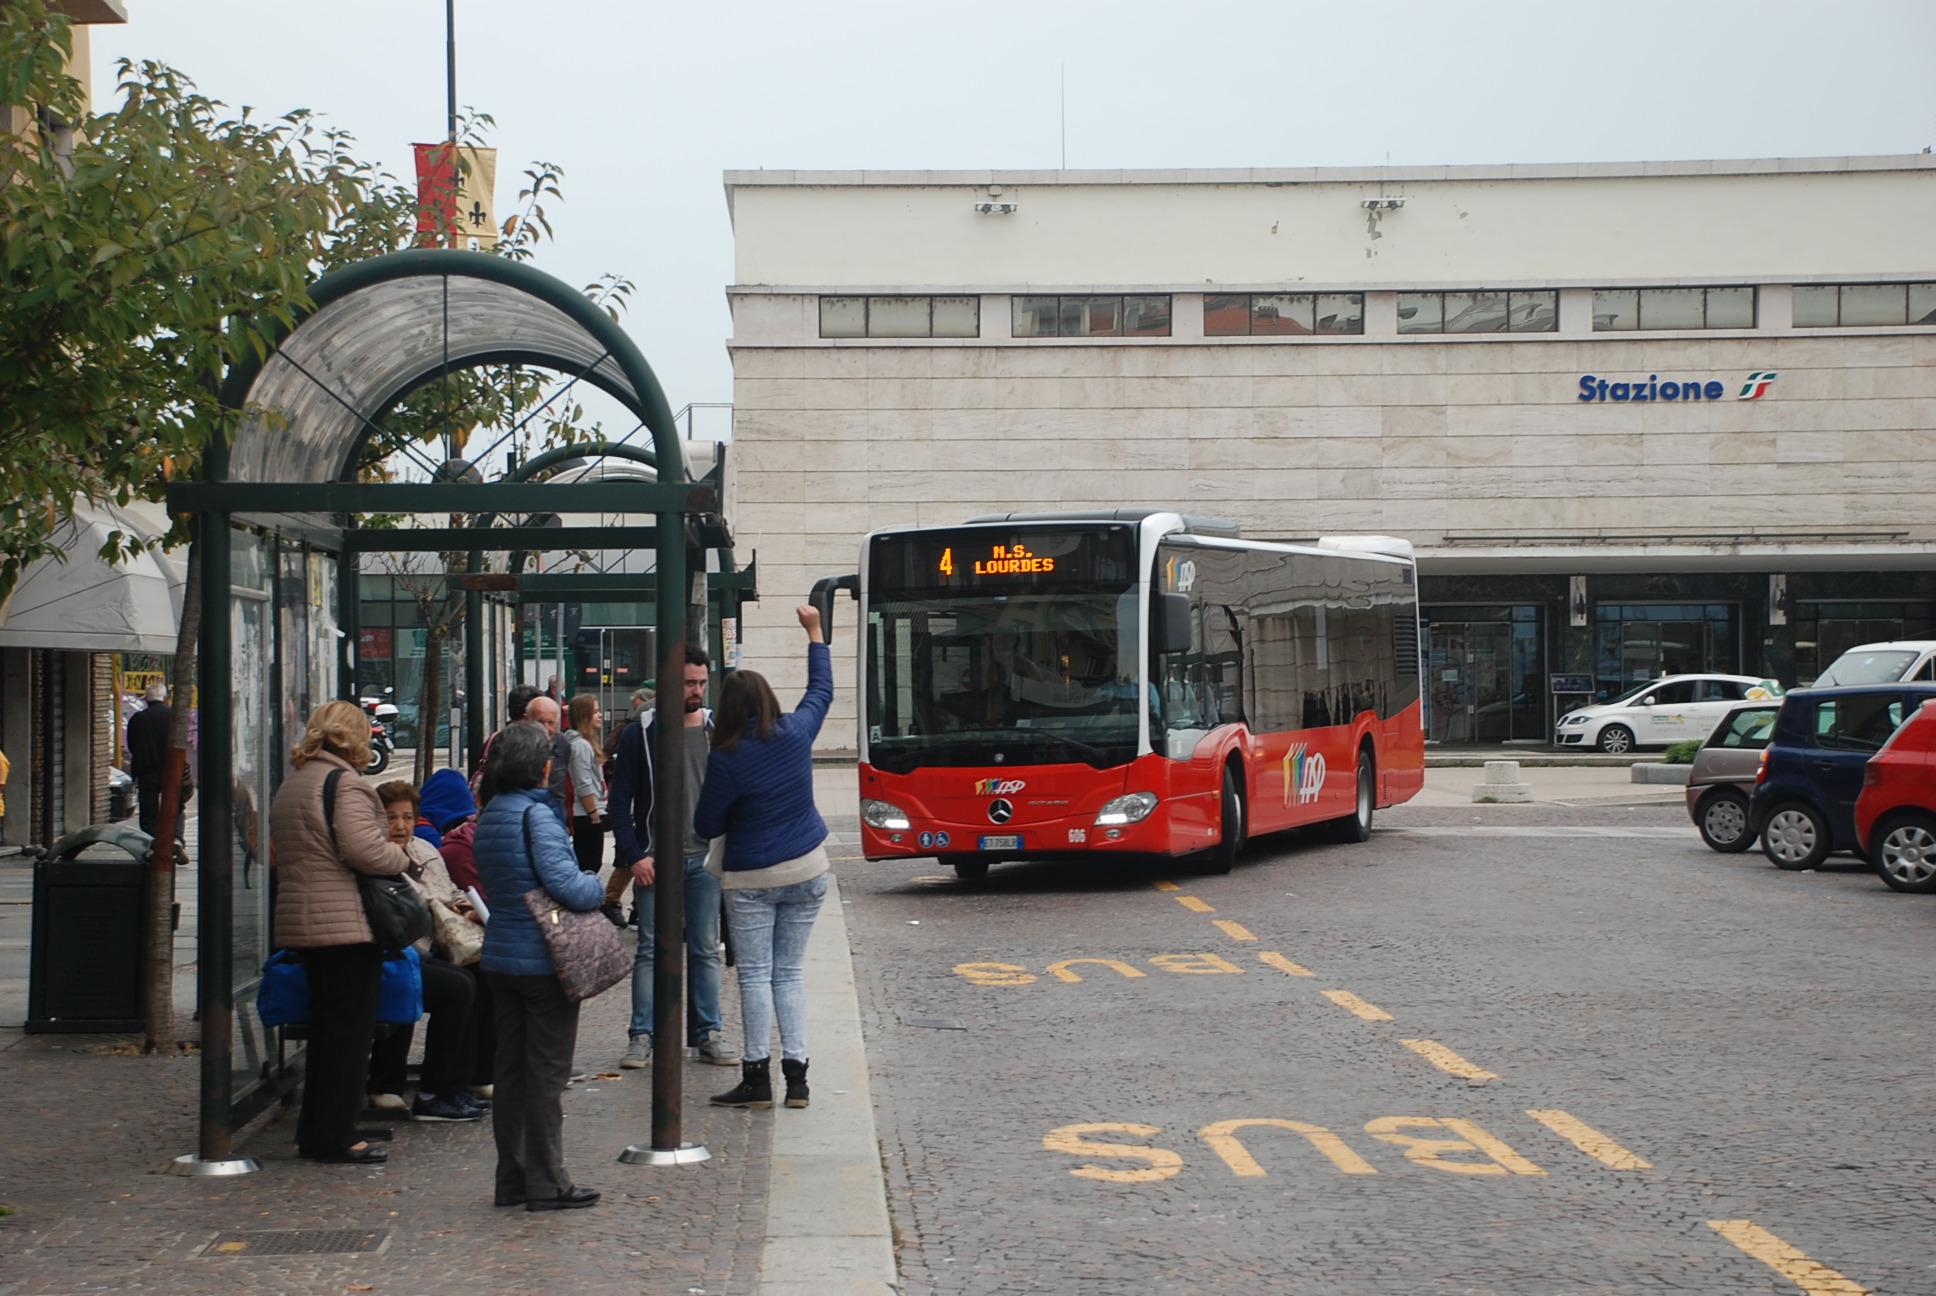 30-variazioni linea 4 per chiusura piazza NS Lourdes